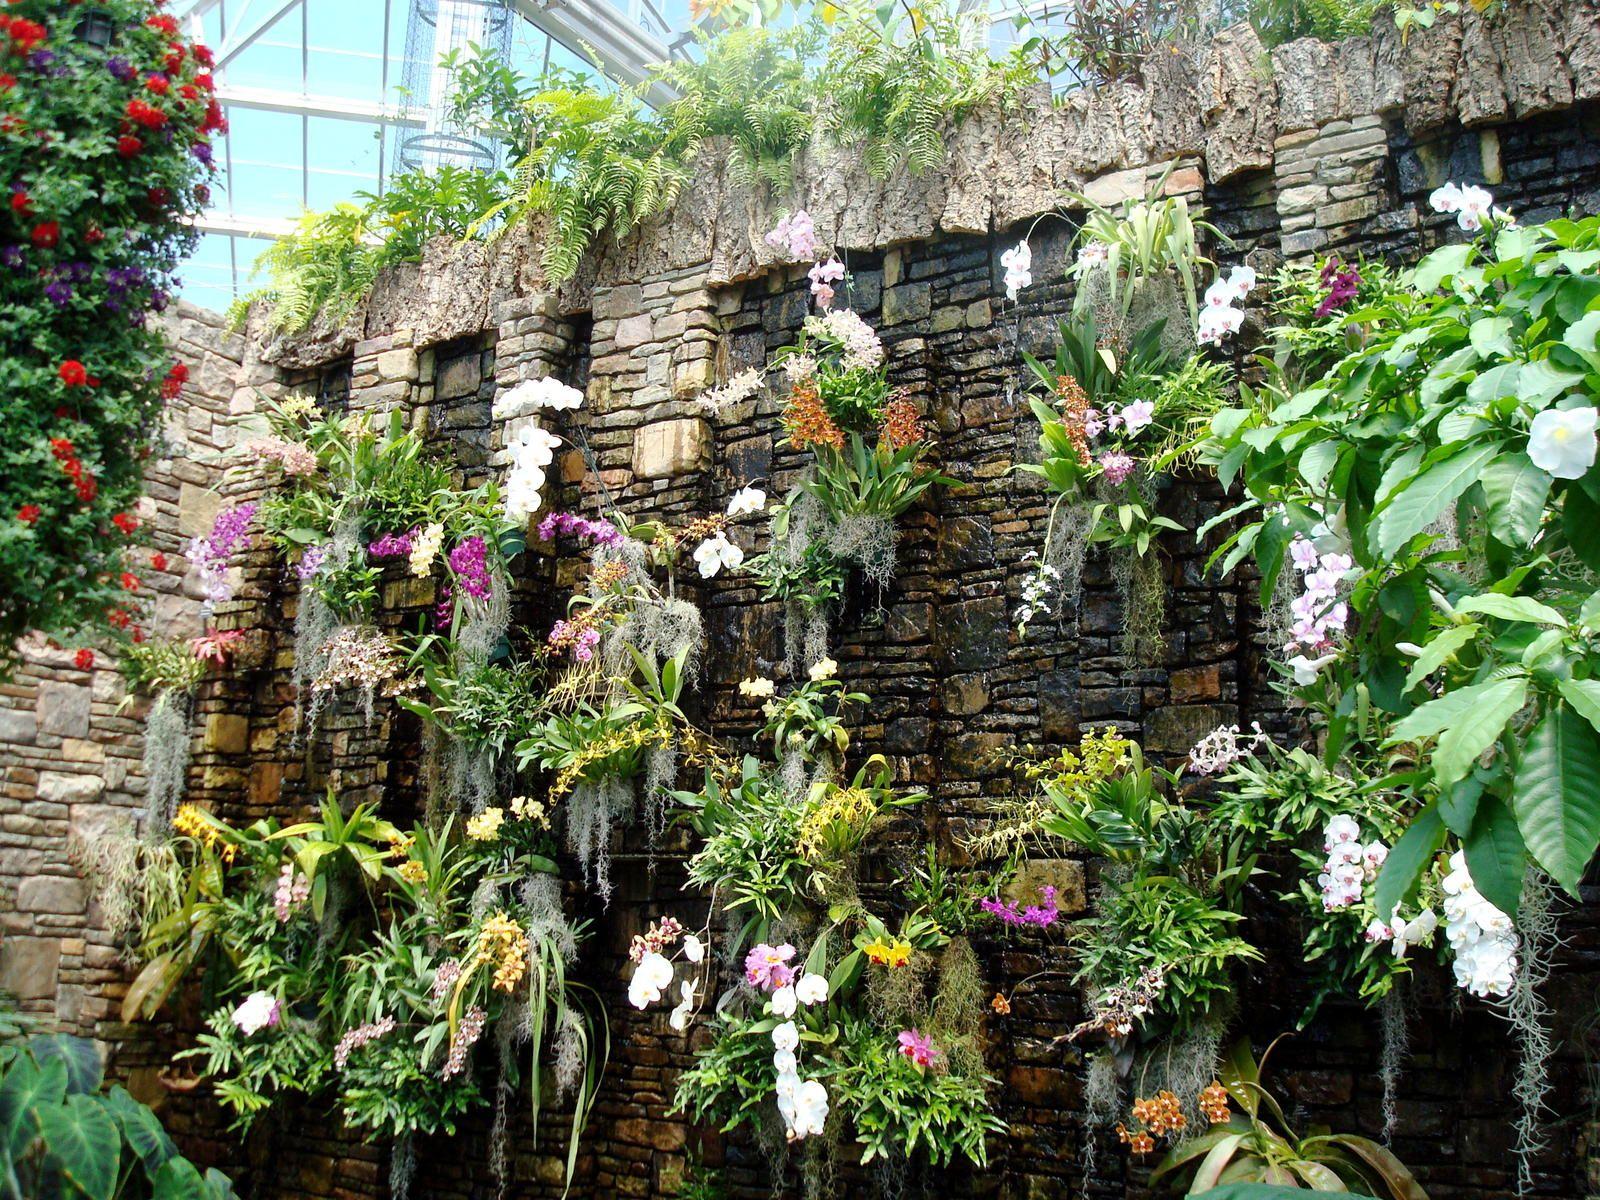 Merveilleux Orchid Conservatory At Daniel Stowe Botanical Garden, Charlotte, NC.